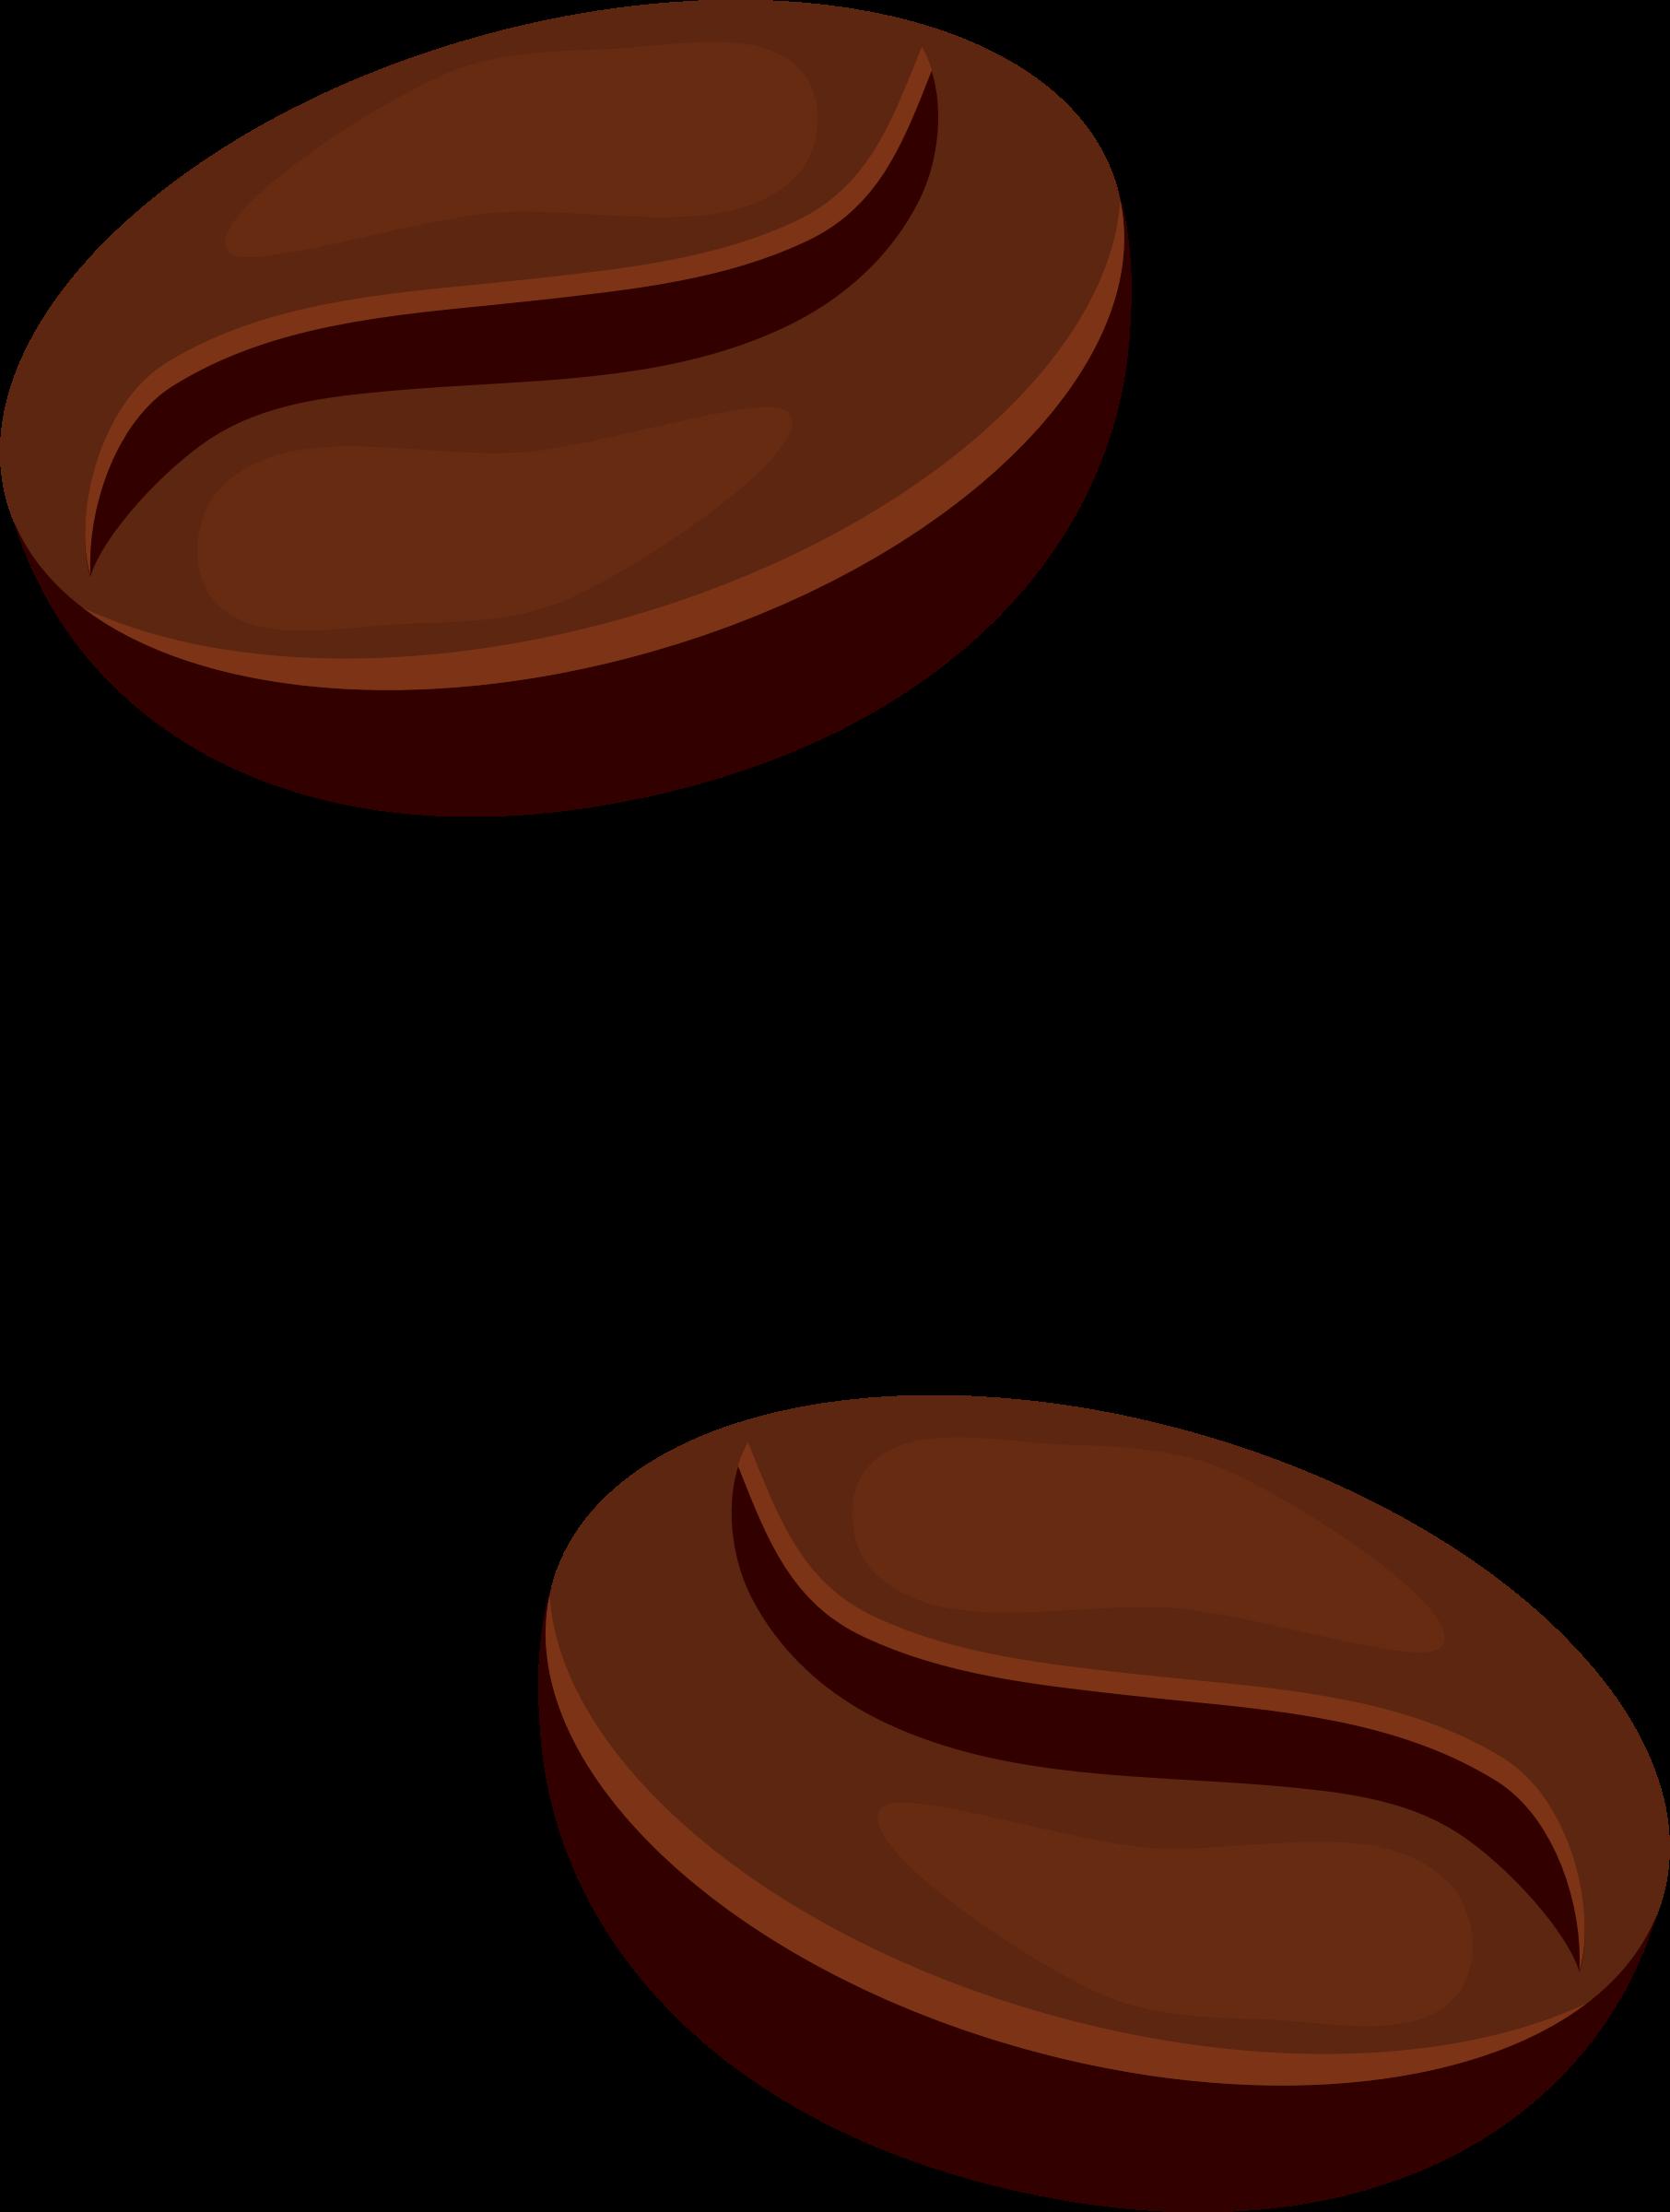 Coffee Beans clipart Coffee beans beans Coffee Clipart